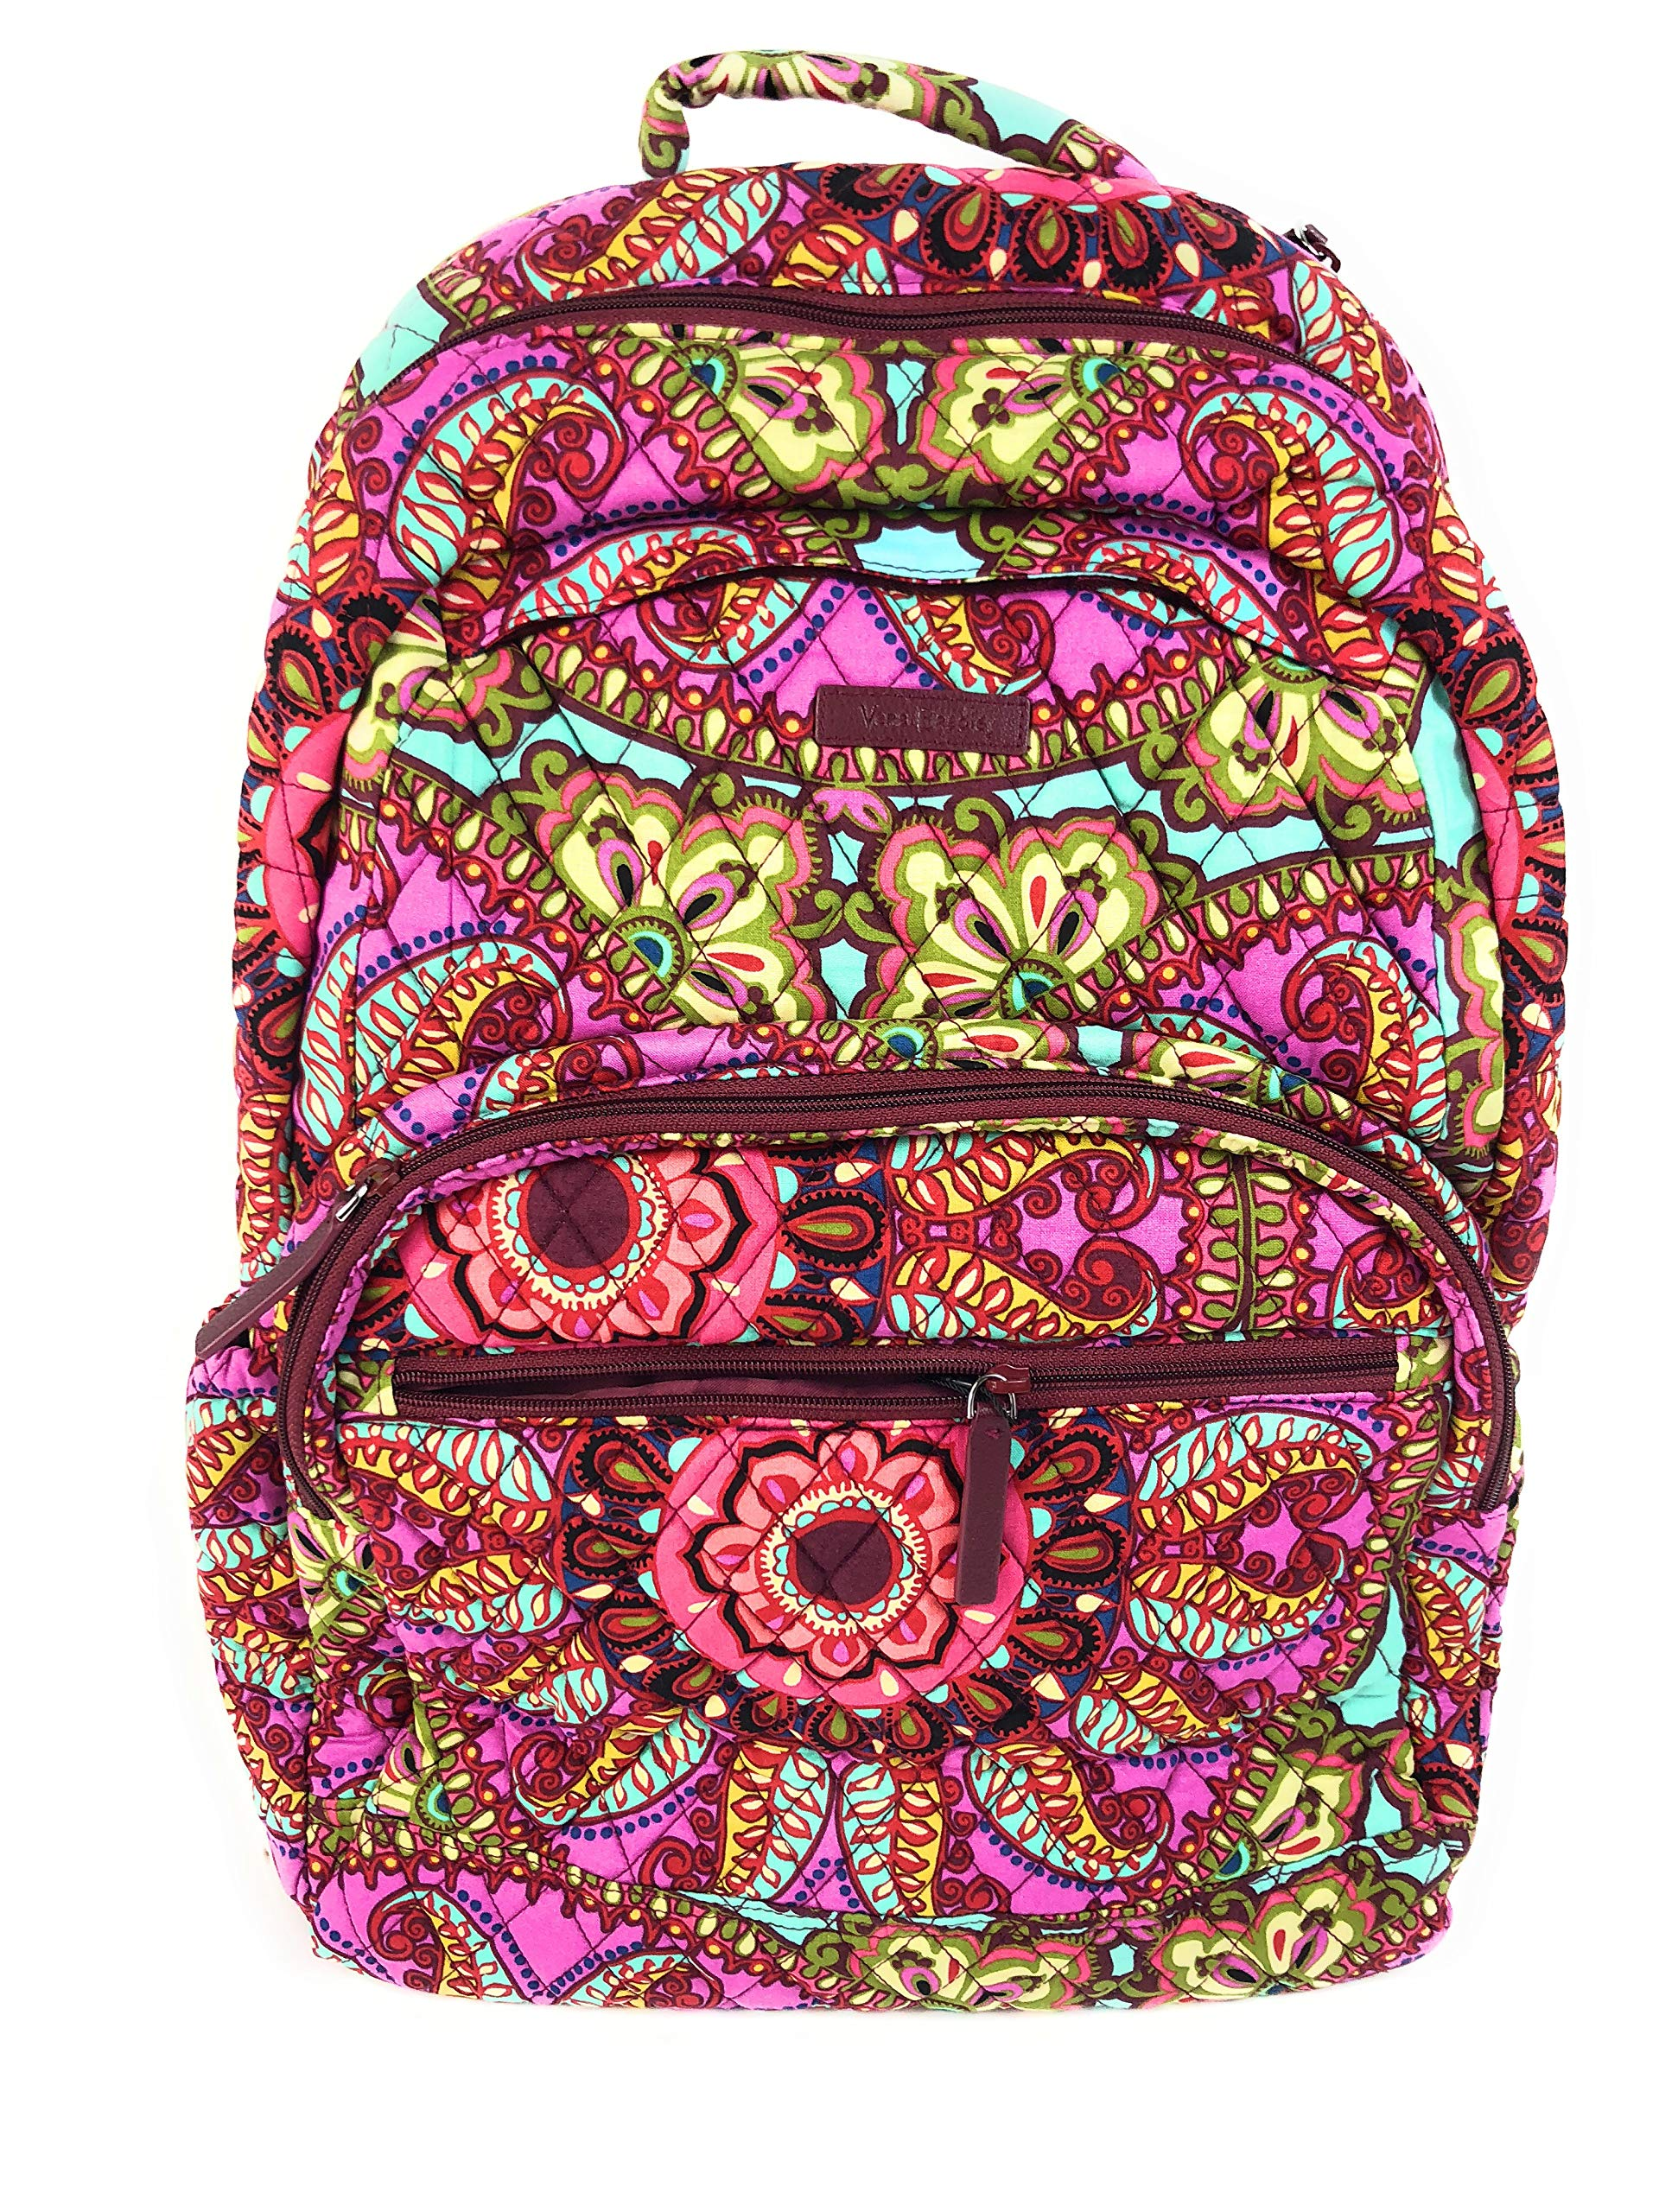 Vera Bradley Essential Large Backpack Cotton Resort Medallion by Vera Bradley